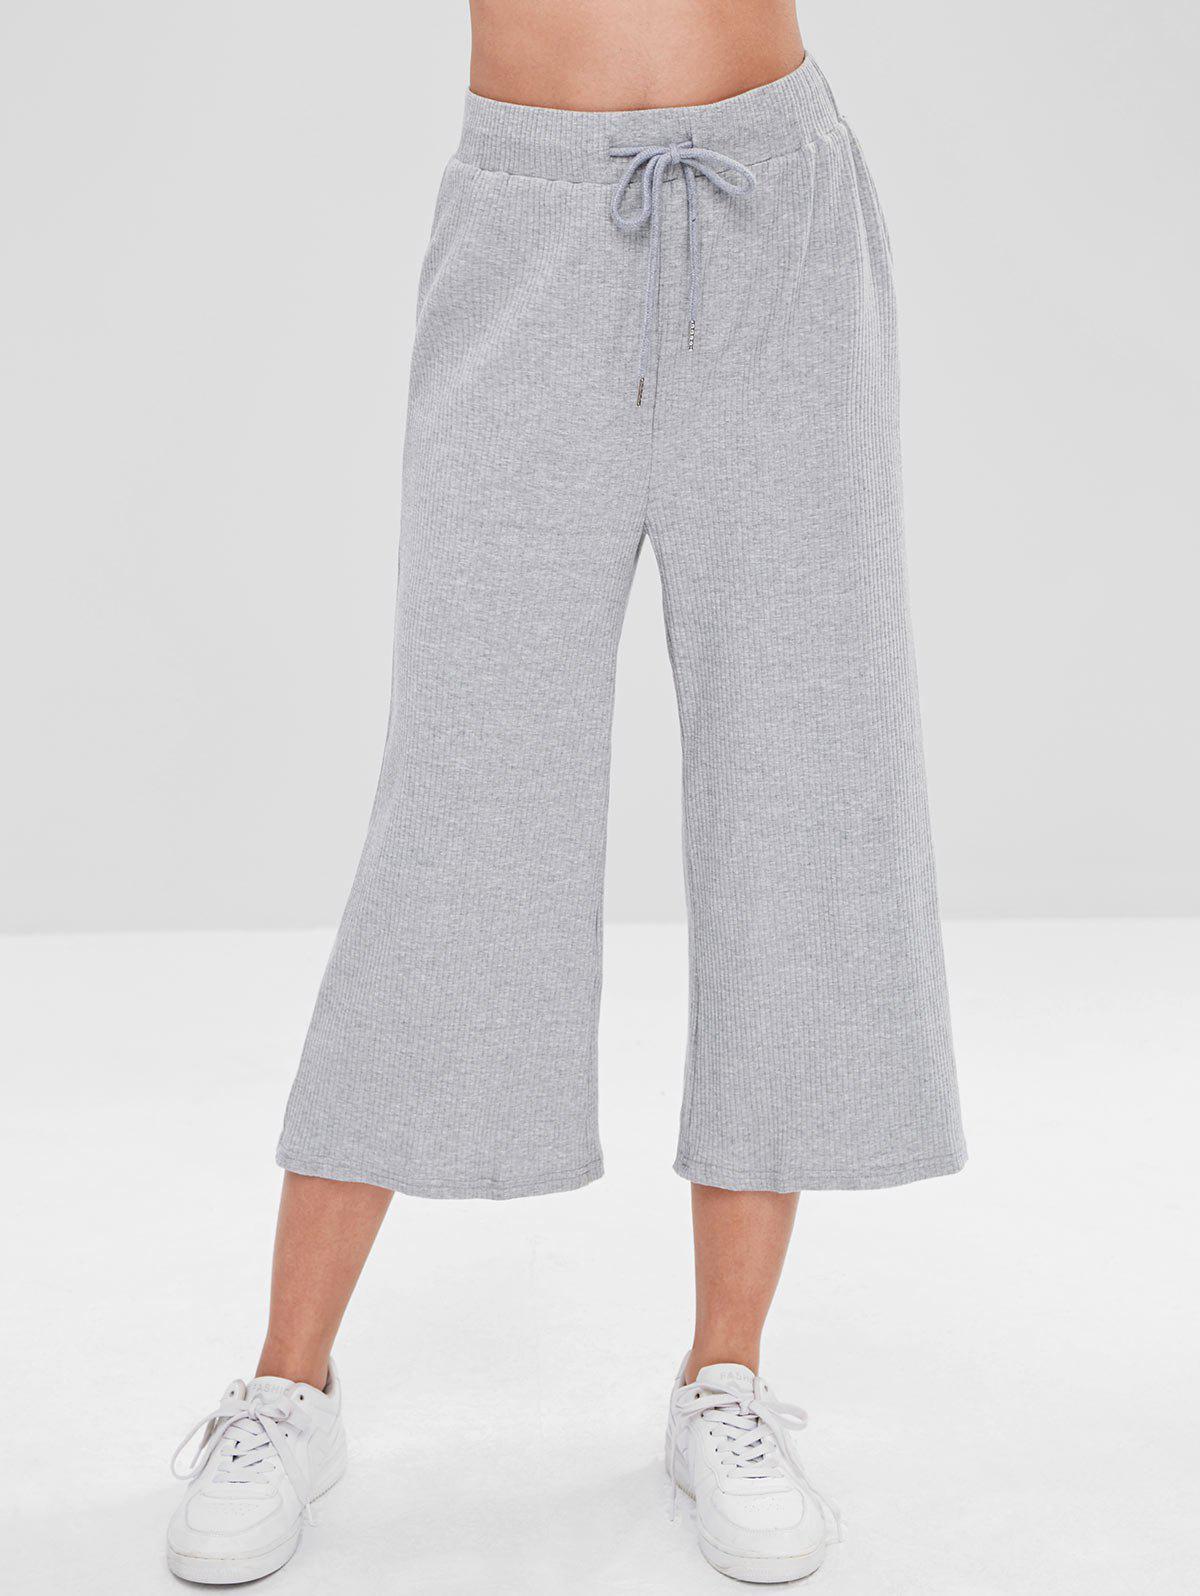 ZAFUL Ribbed Wide Leg Capri Pants, Gray